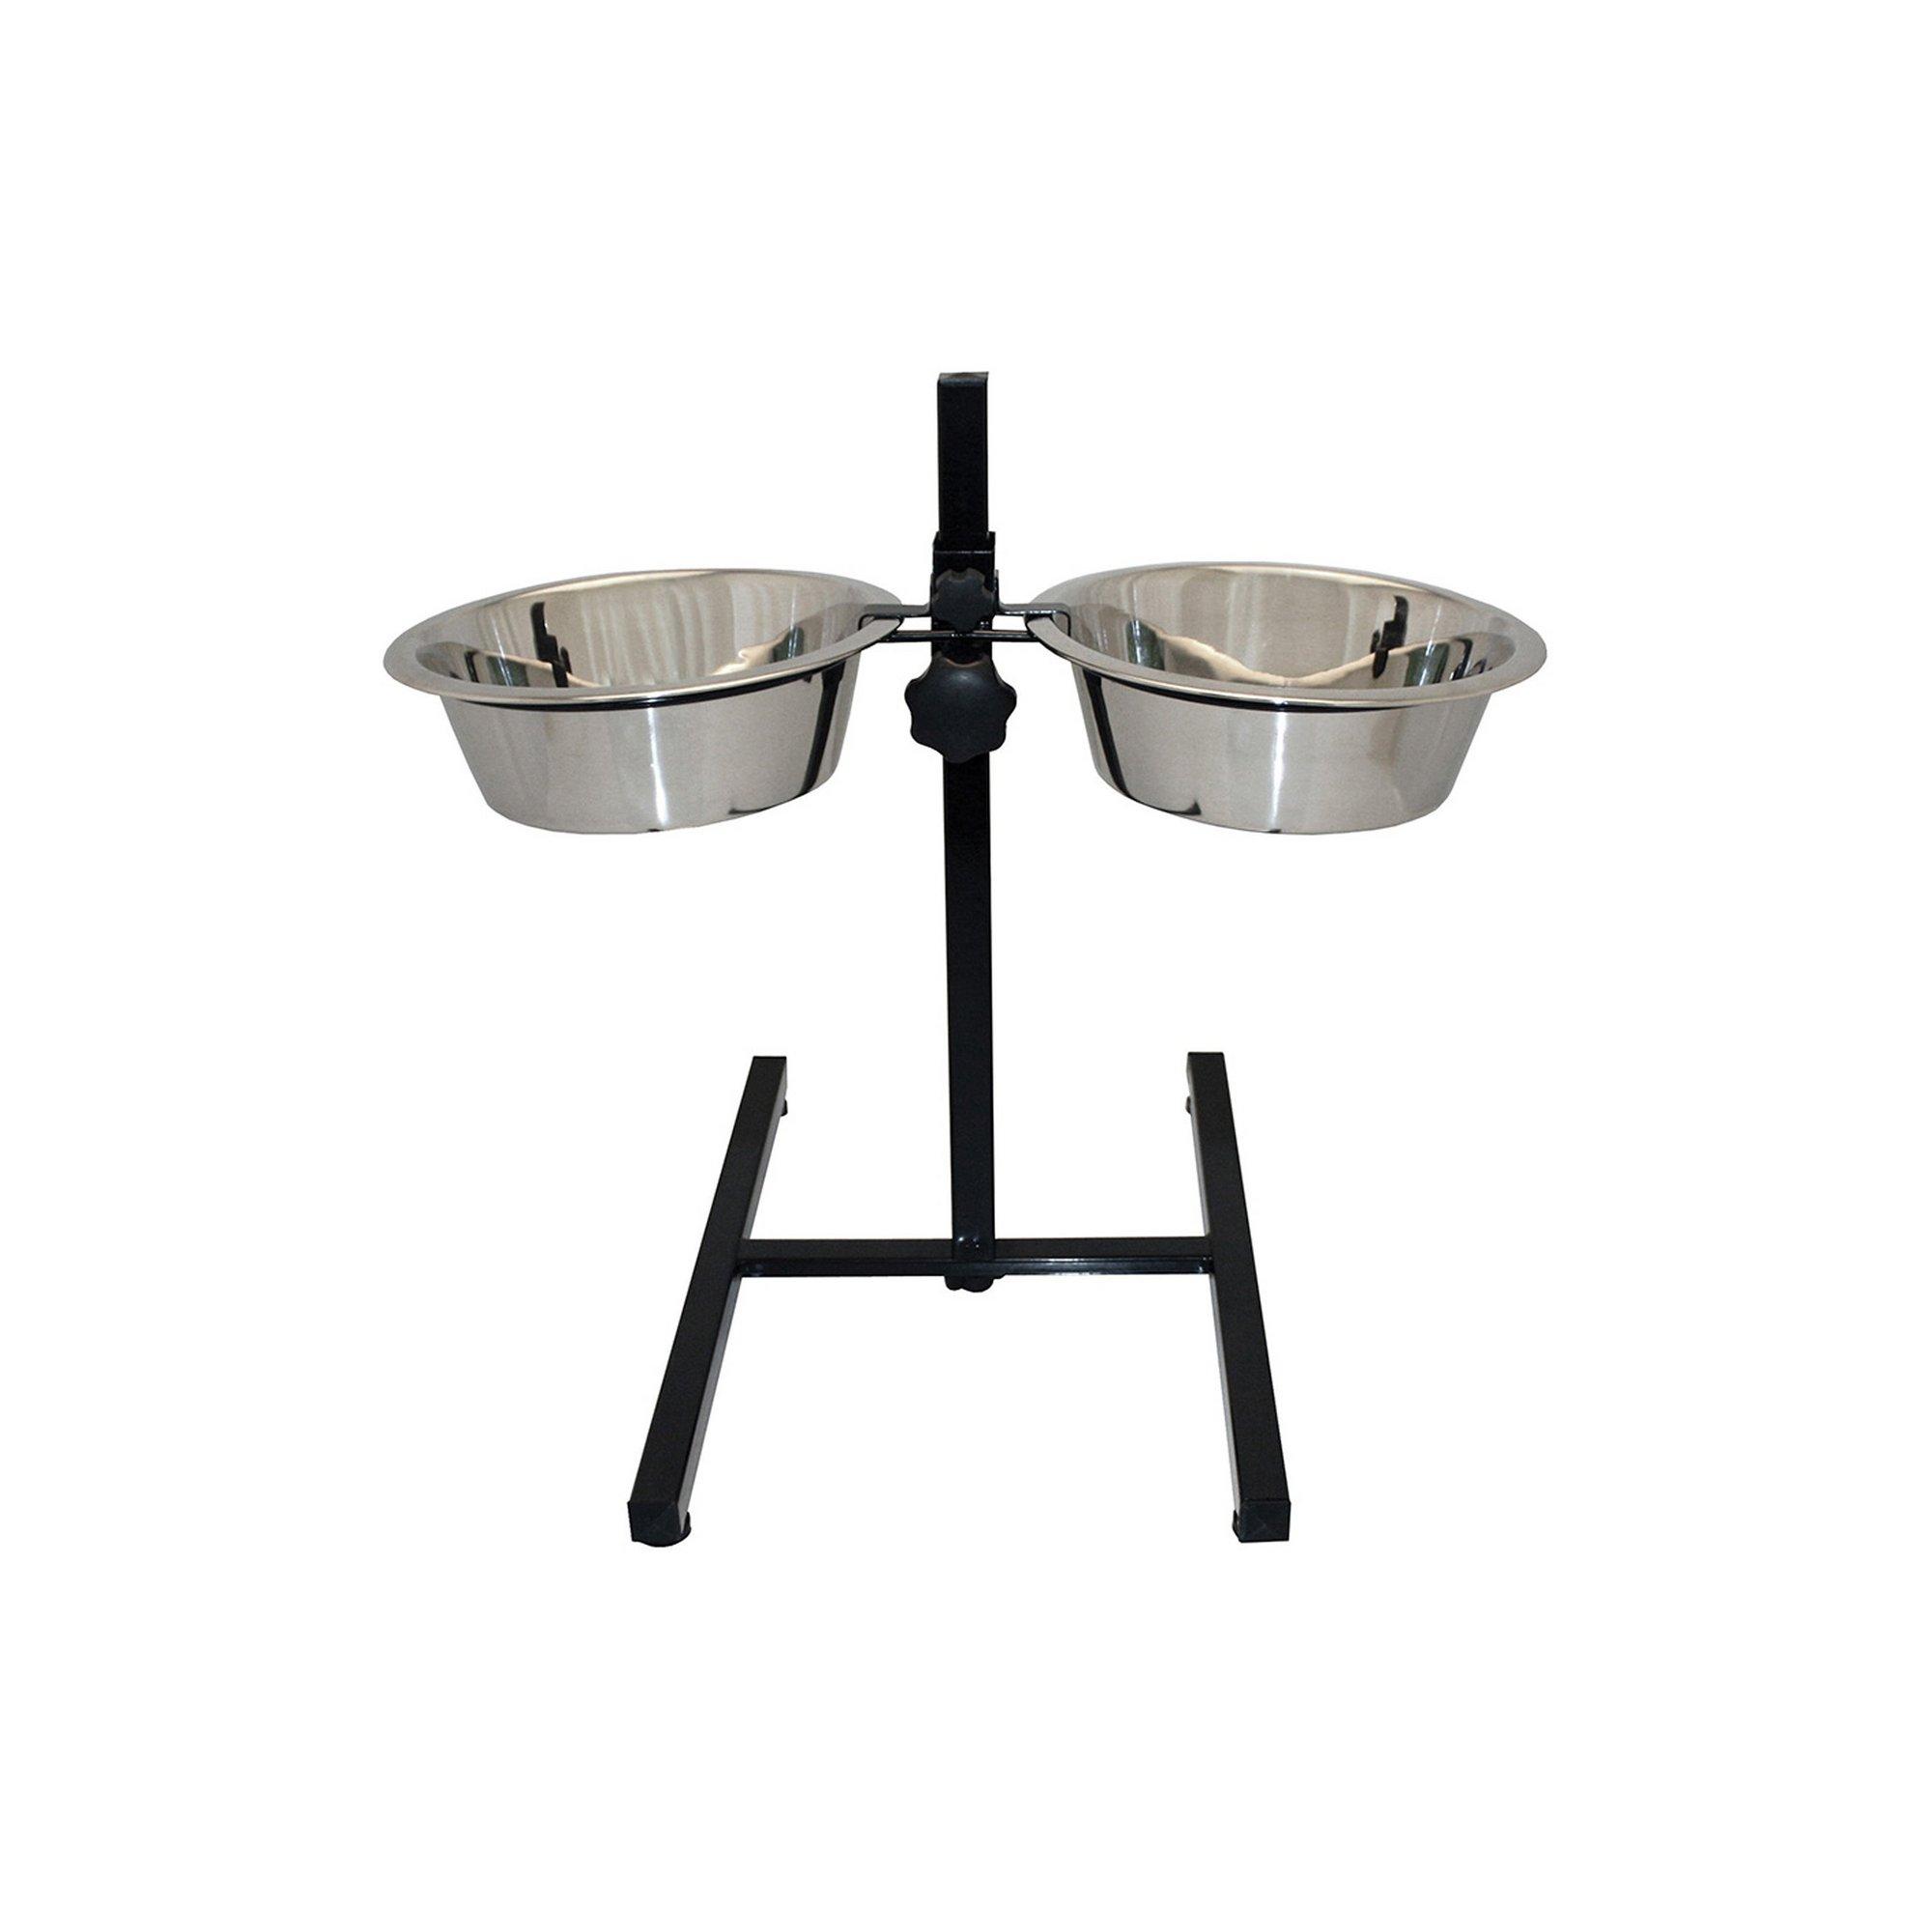 Image of Adjustable Double Diner Pet Bowl 29cm